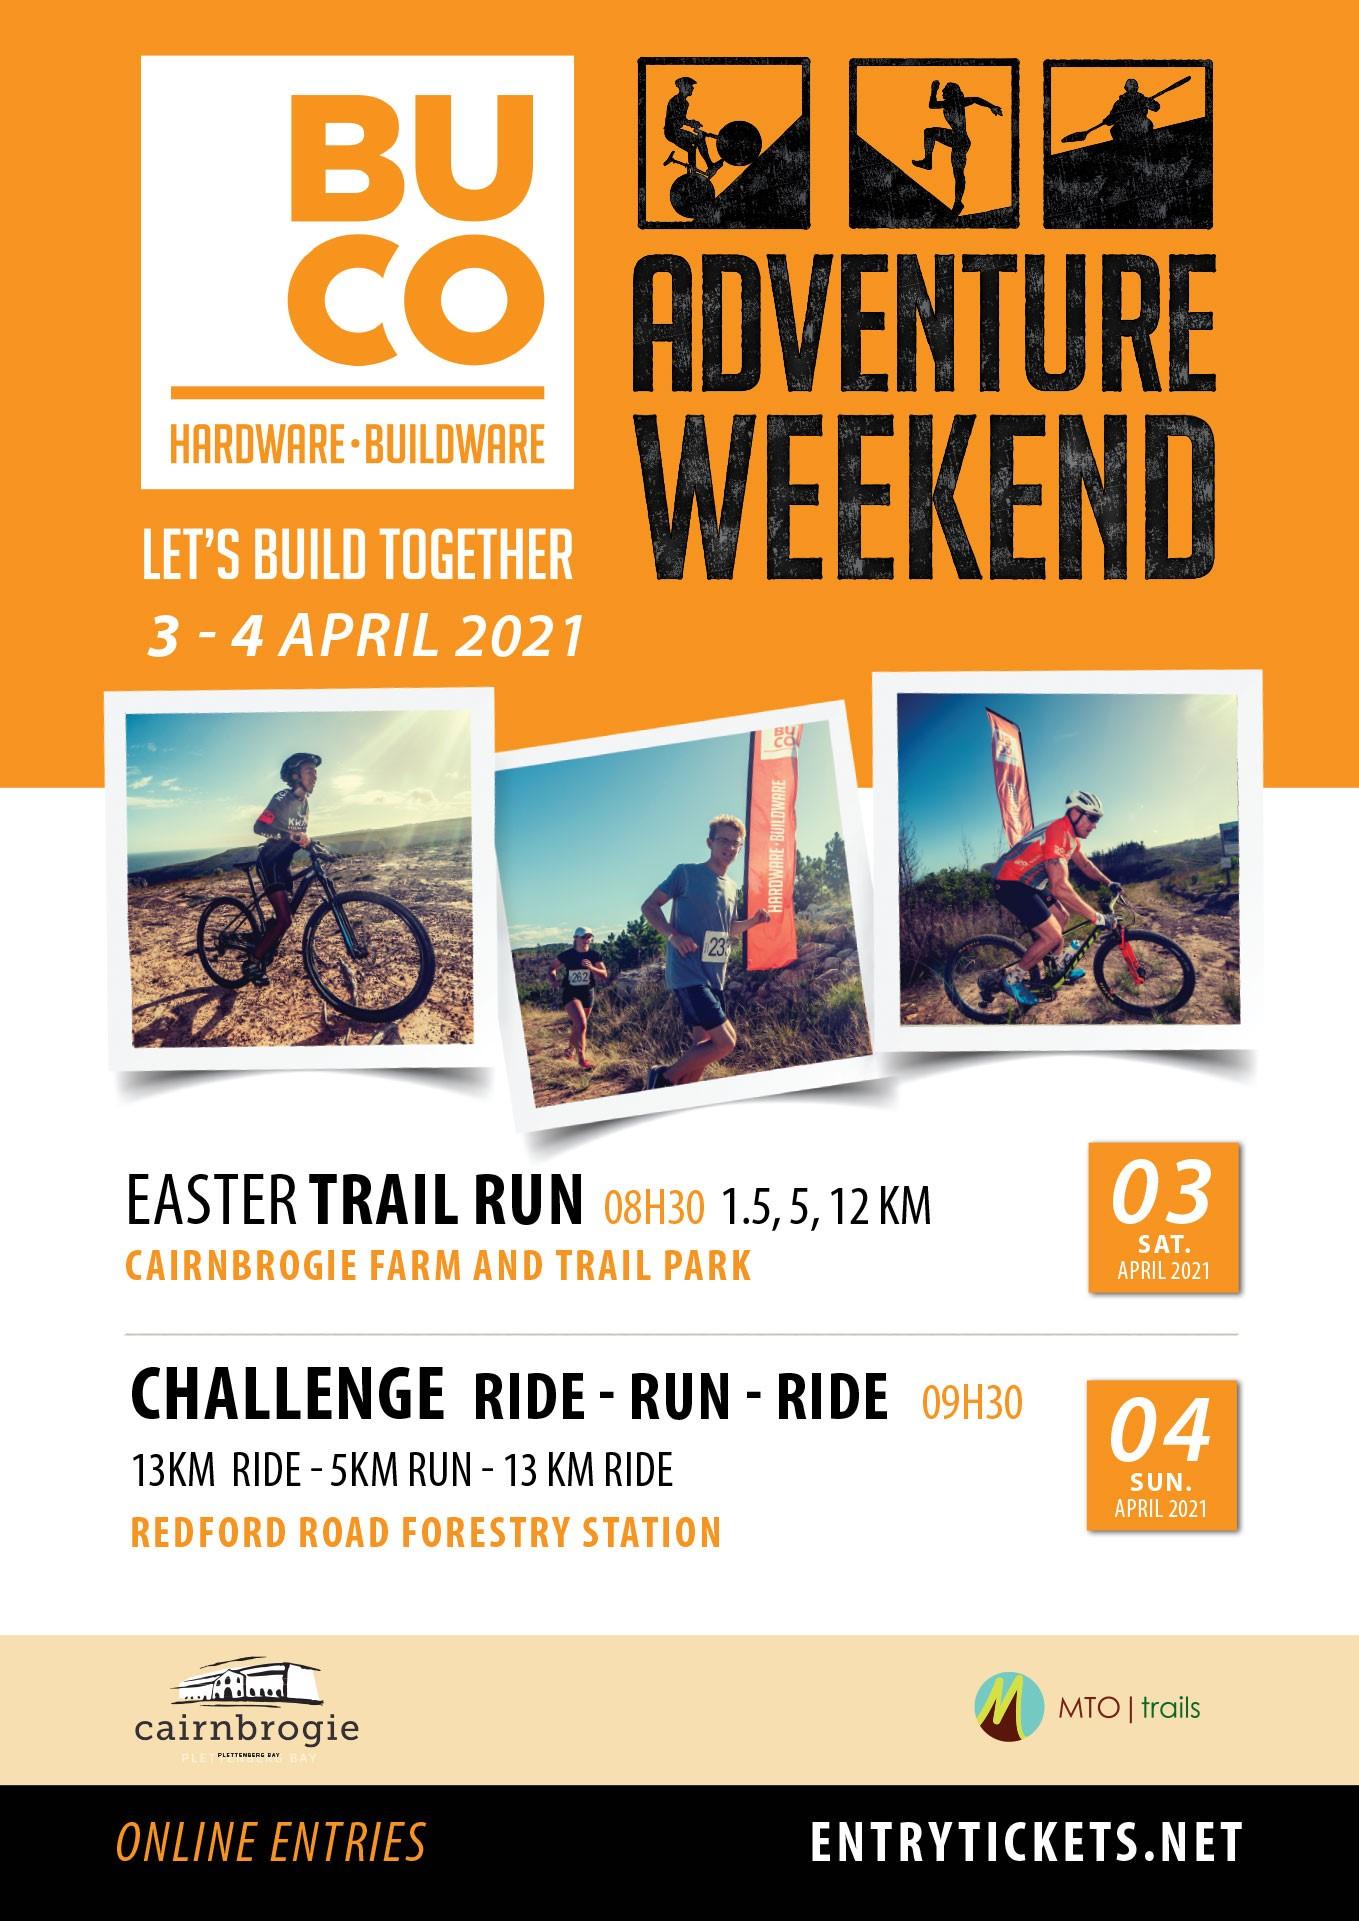 Buco Adventure Weekend Trail Runs